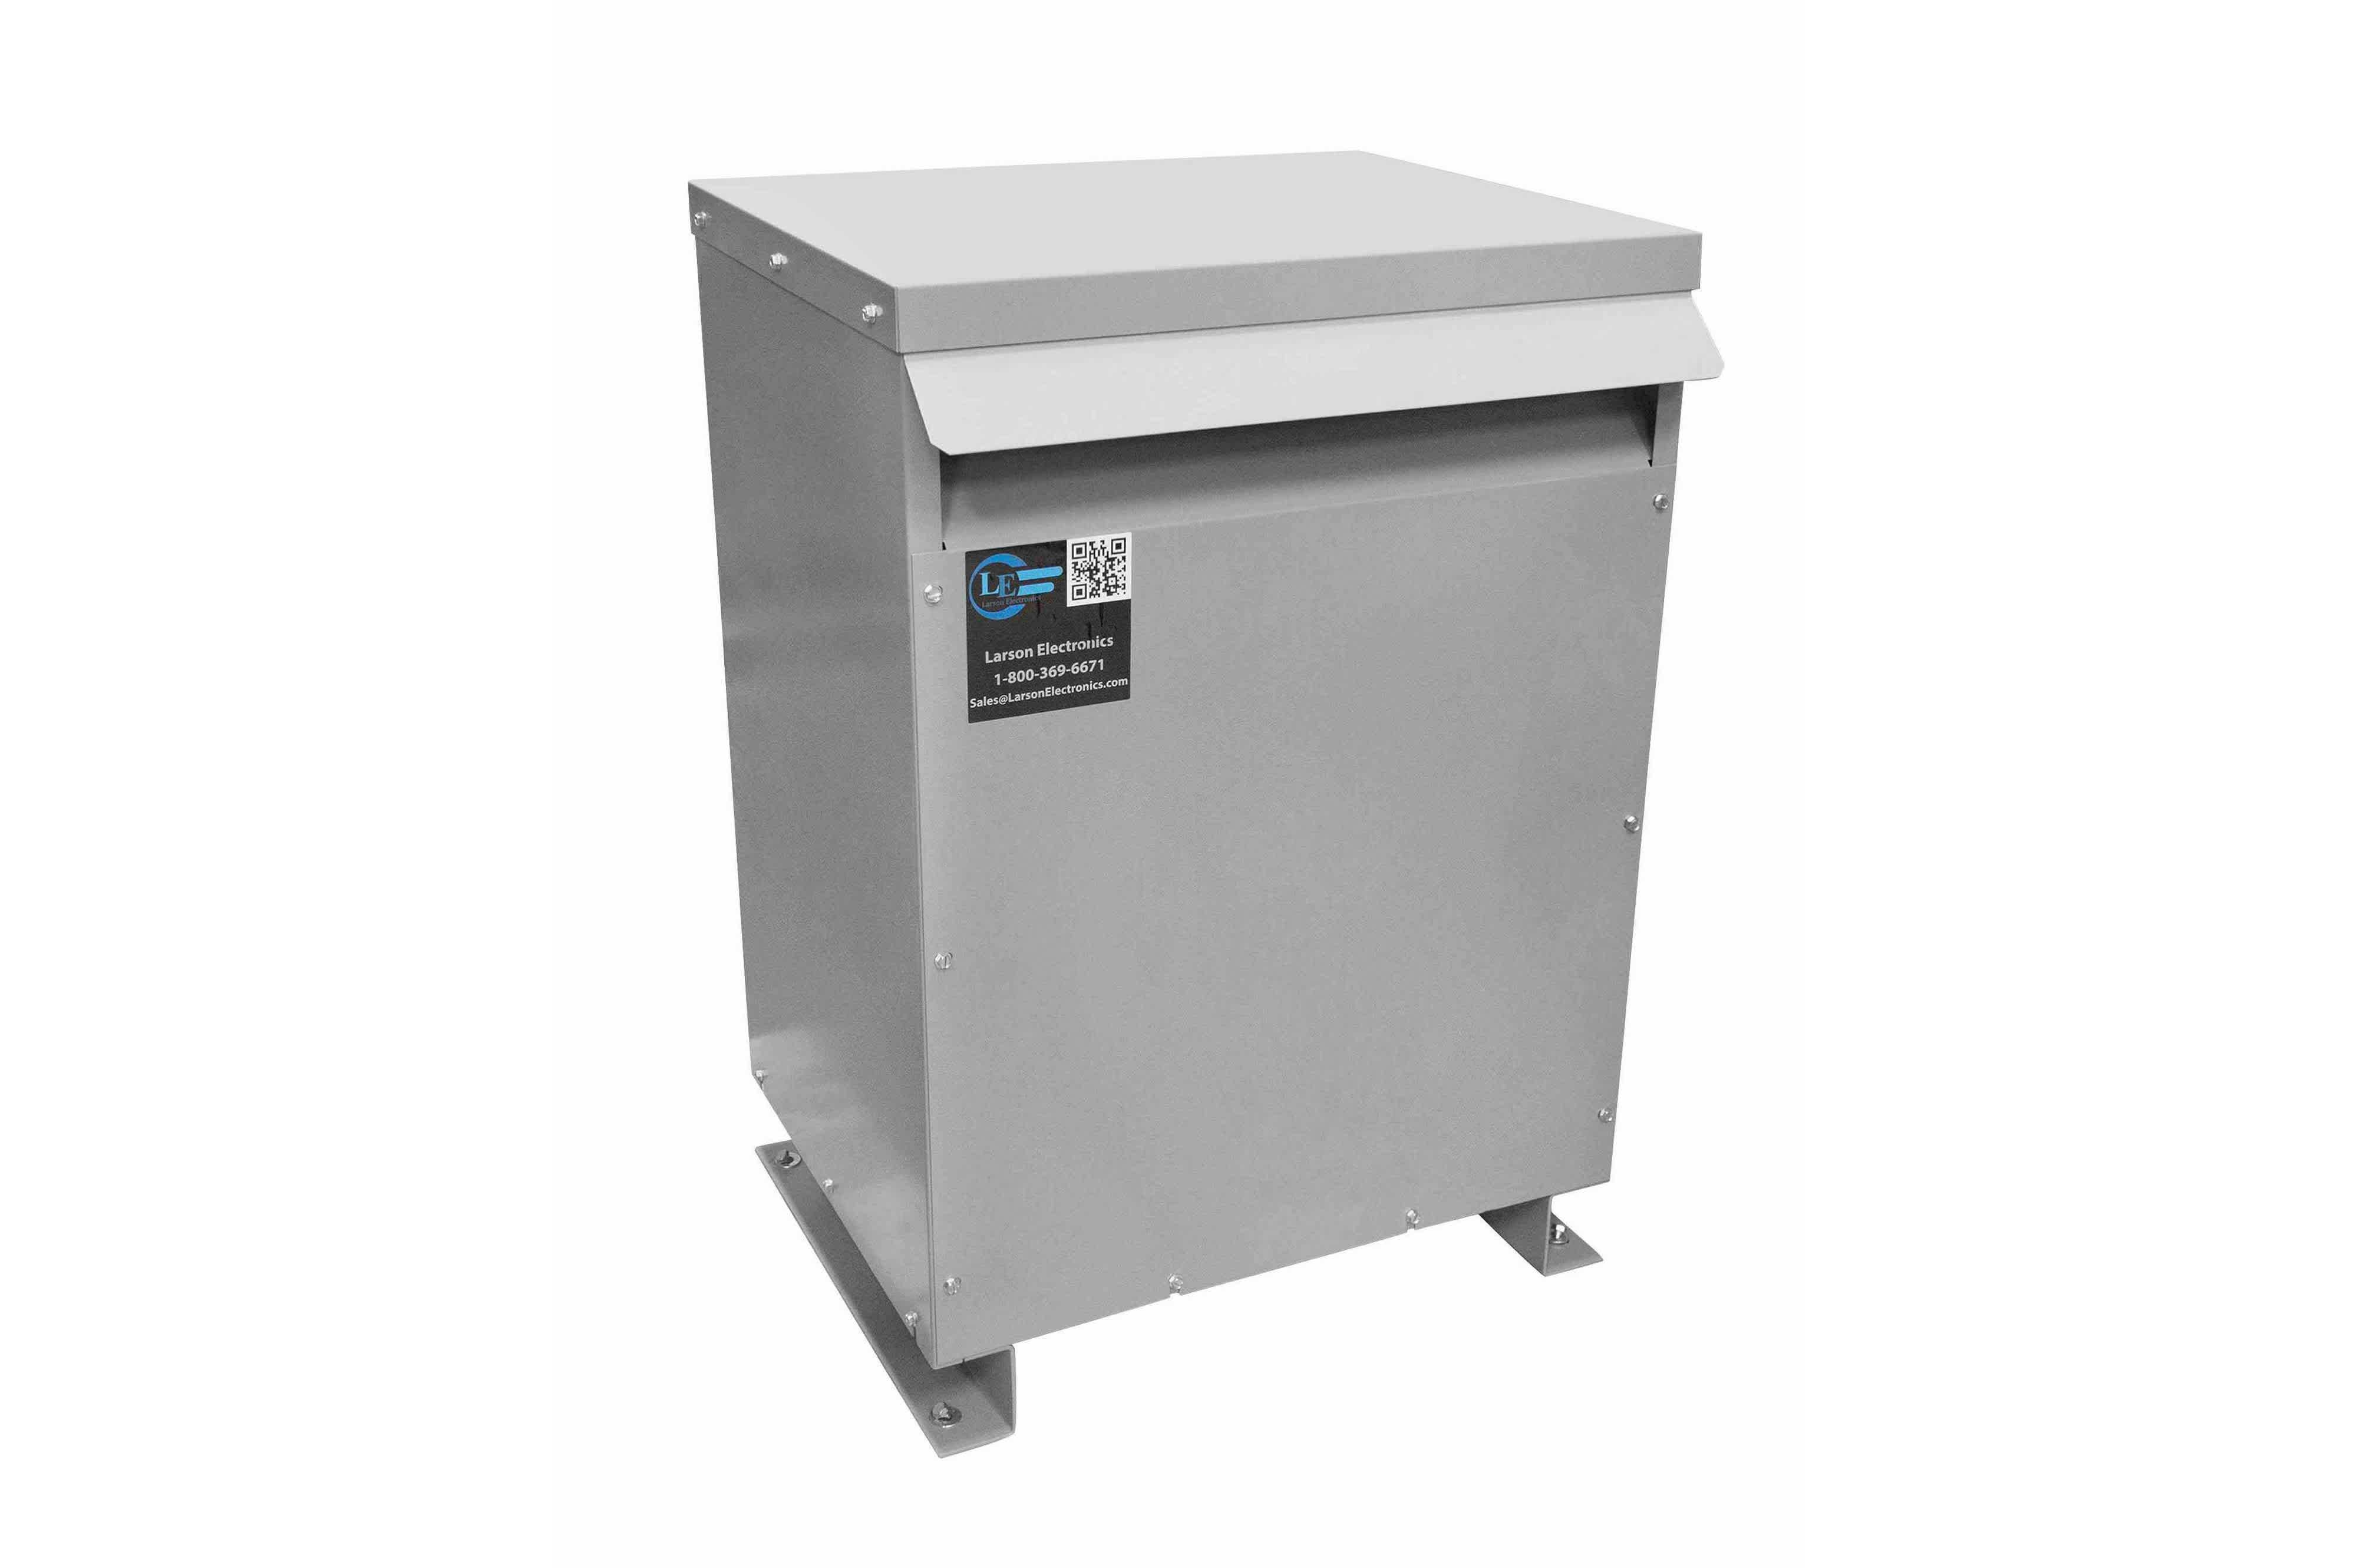 225 kVA 3PH DOE Transformer, 208V Delta Primary, 400Y/231 Wye-N Secondary, N3R, Ventilated, 60 Hz